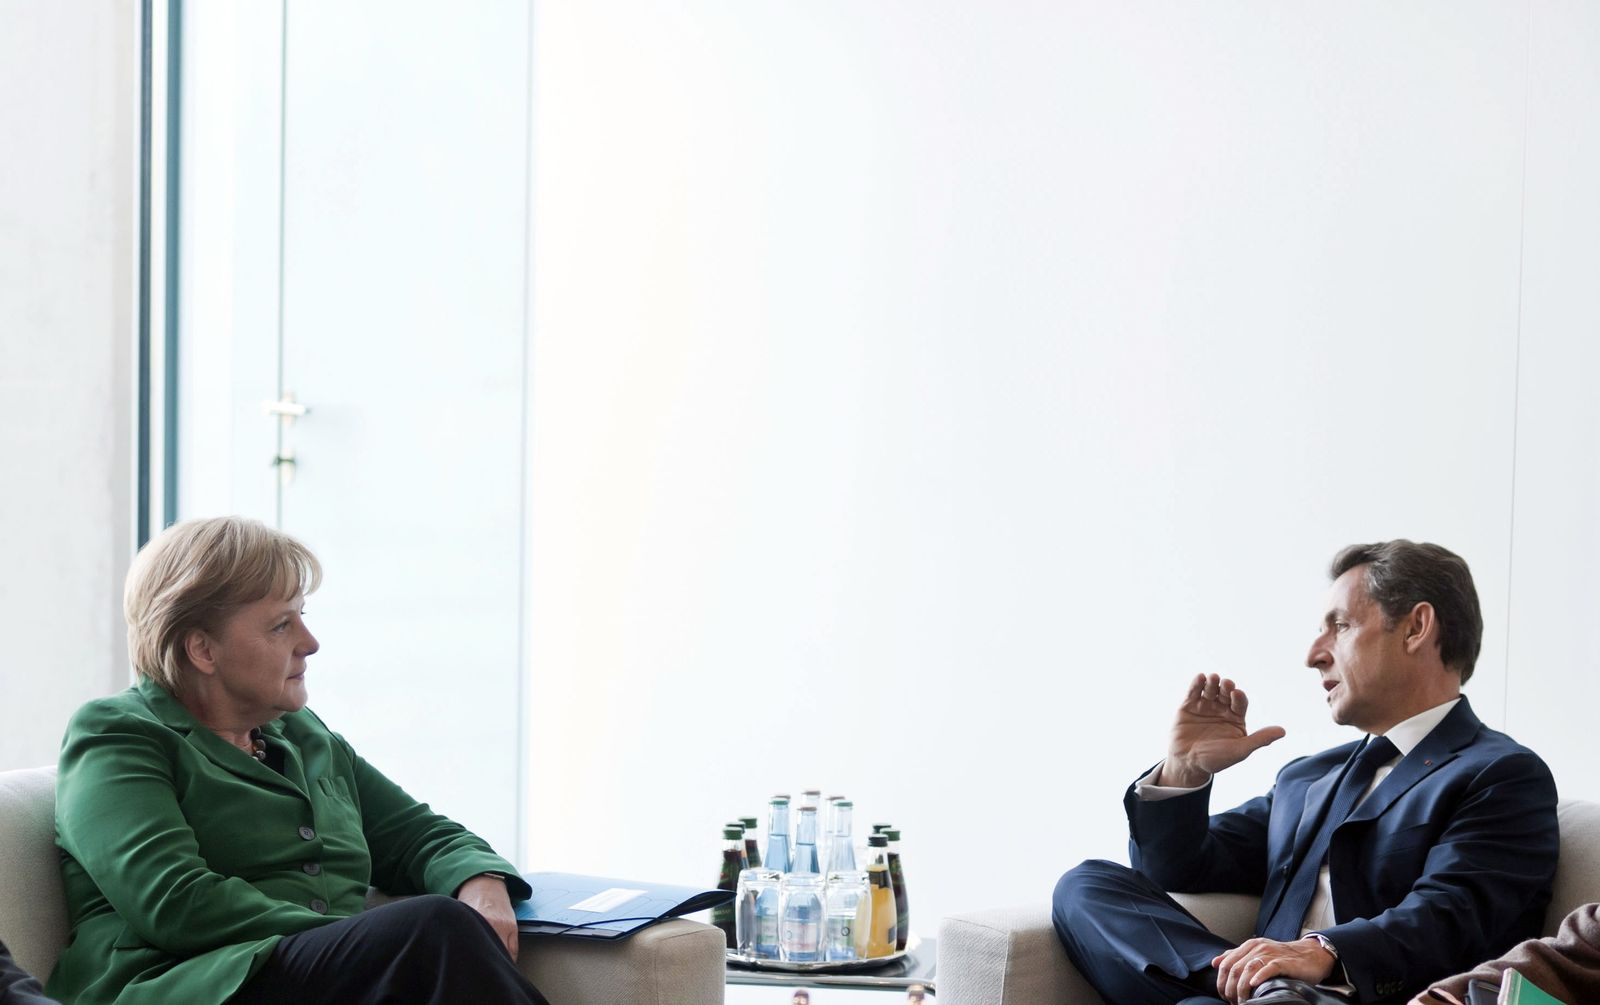 Angela Merkel / Nicolas Sarkozy